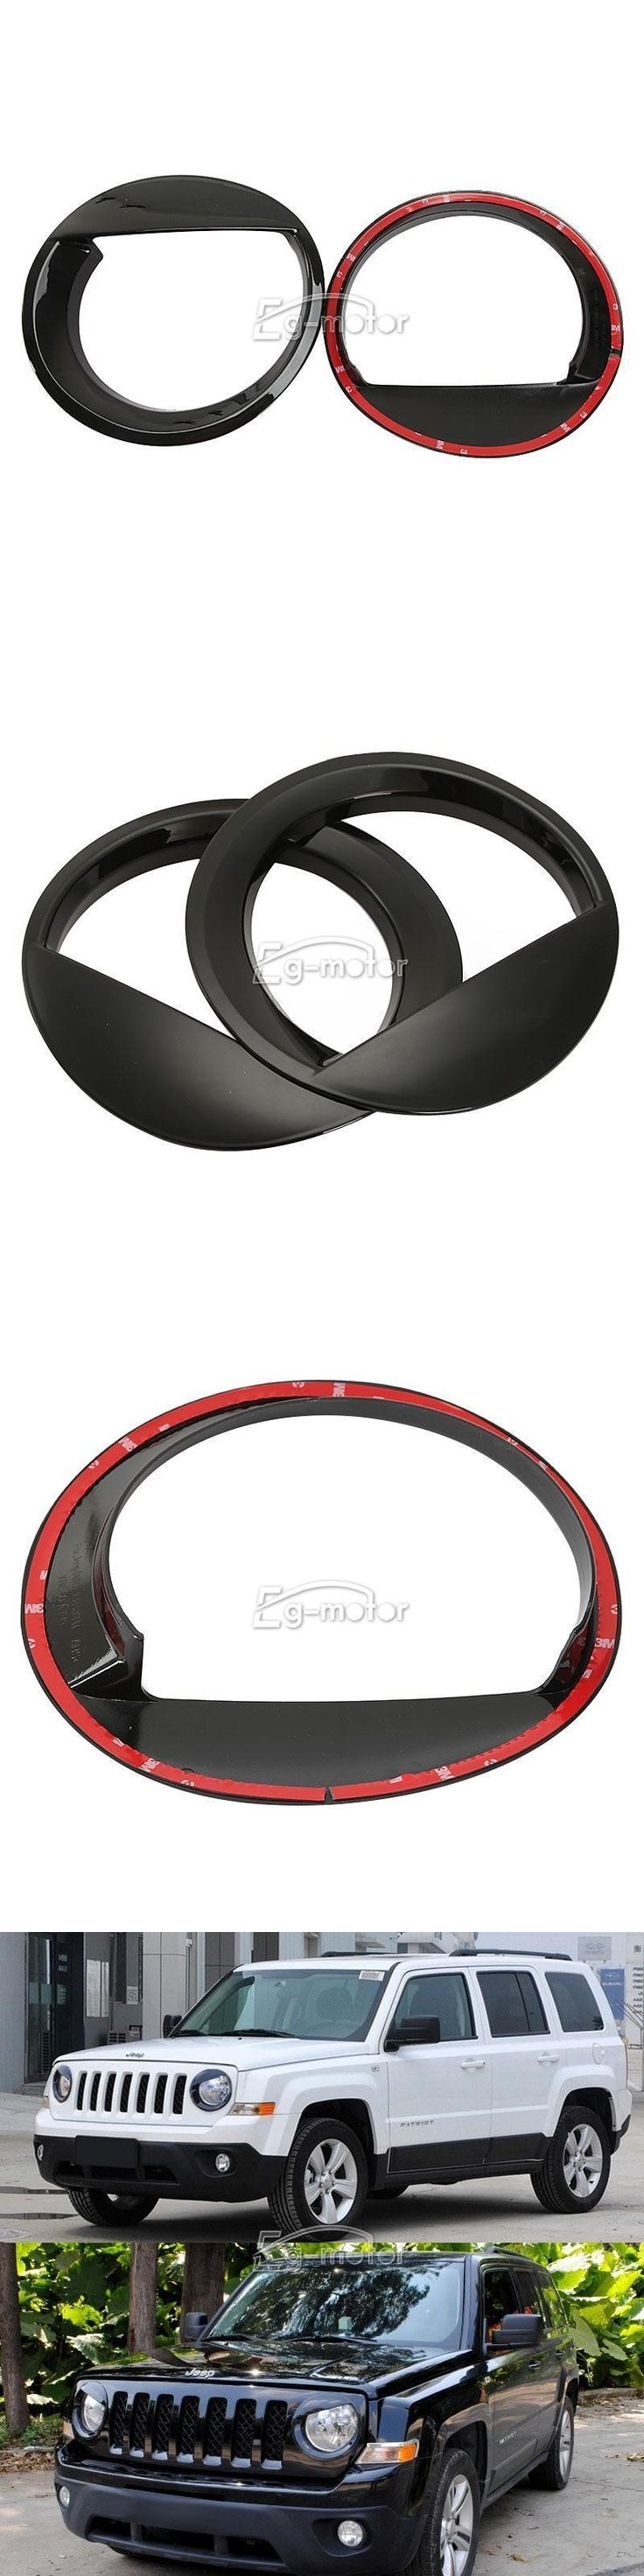 2PCS Eyelid Black Headlight Trim Cover(Left & Right)for 2011-2014 Jeep Patriot